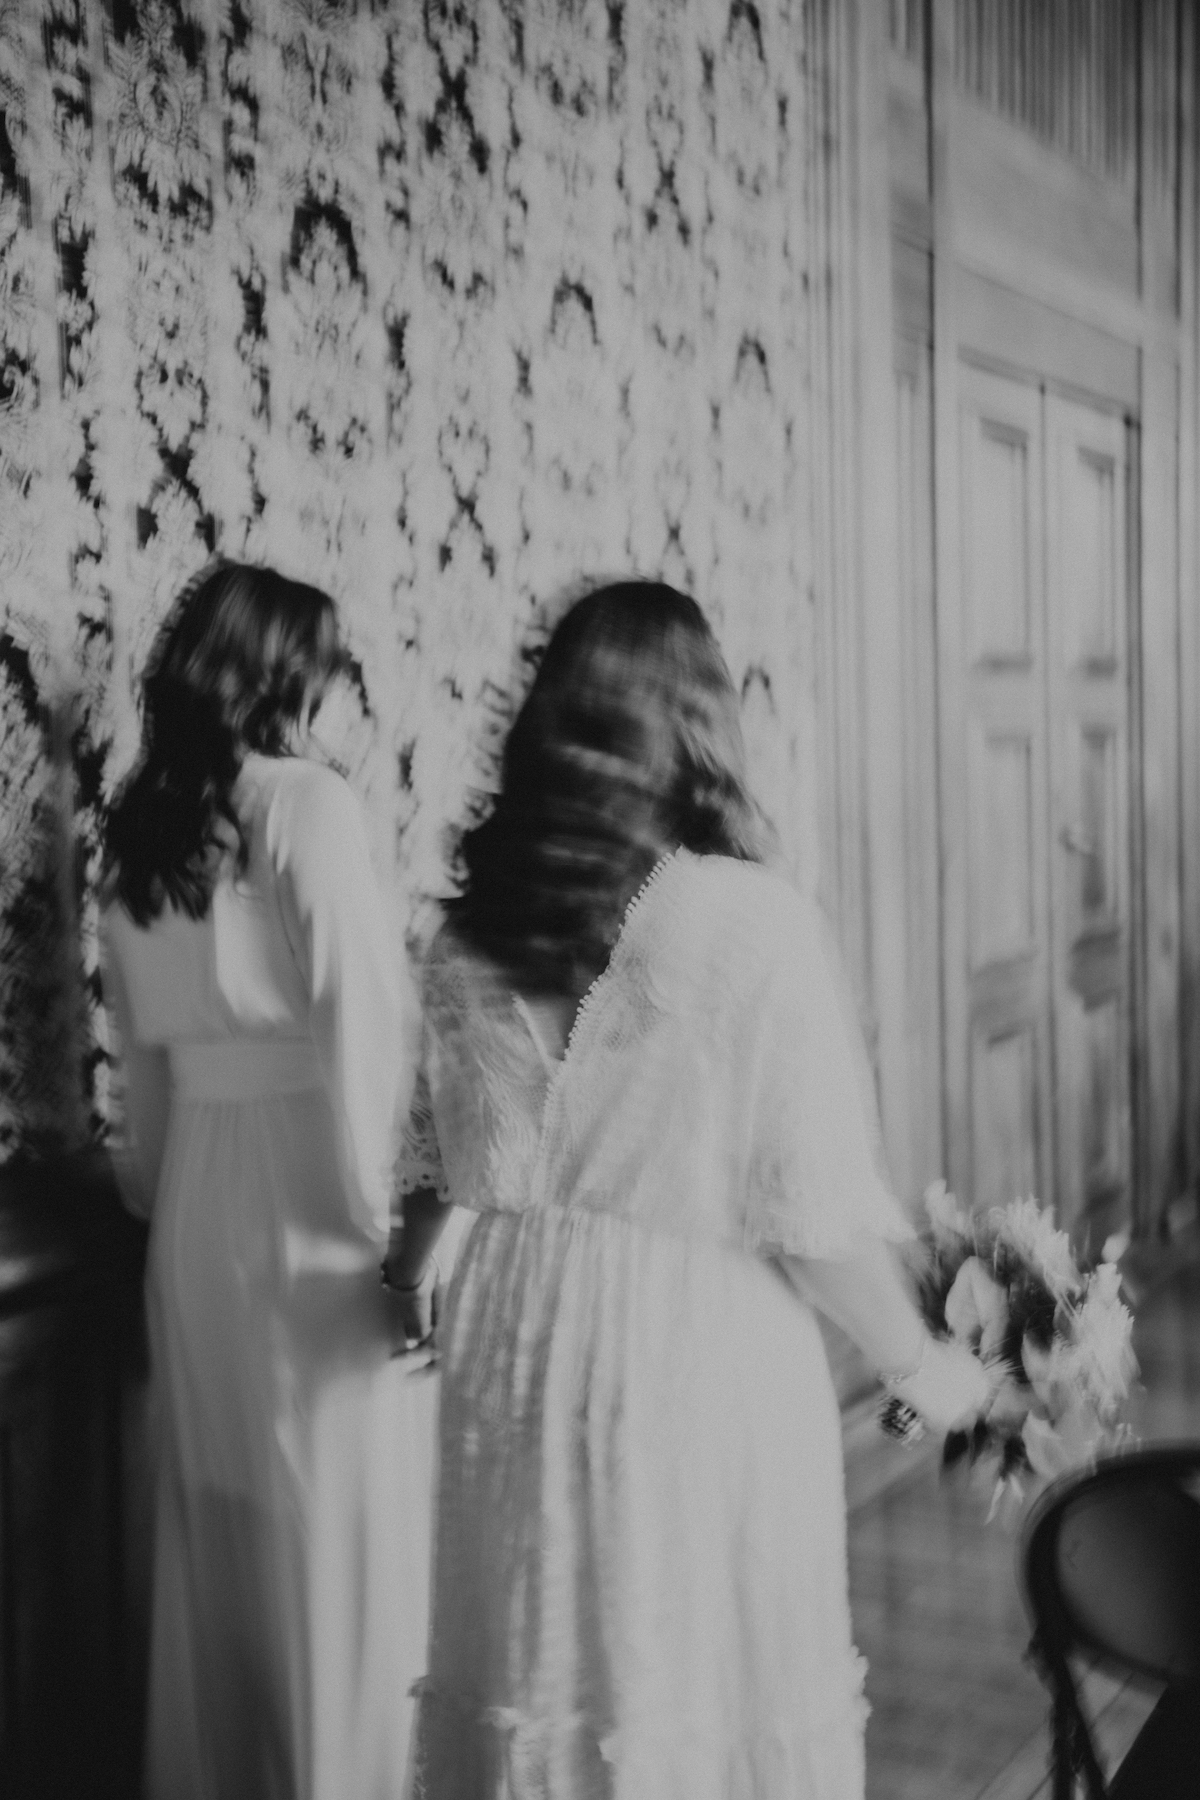 mariage gay robes bouquet de mariee